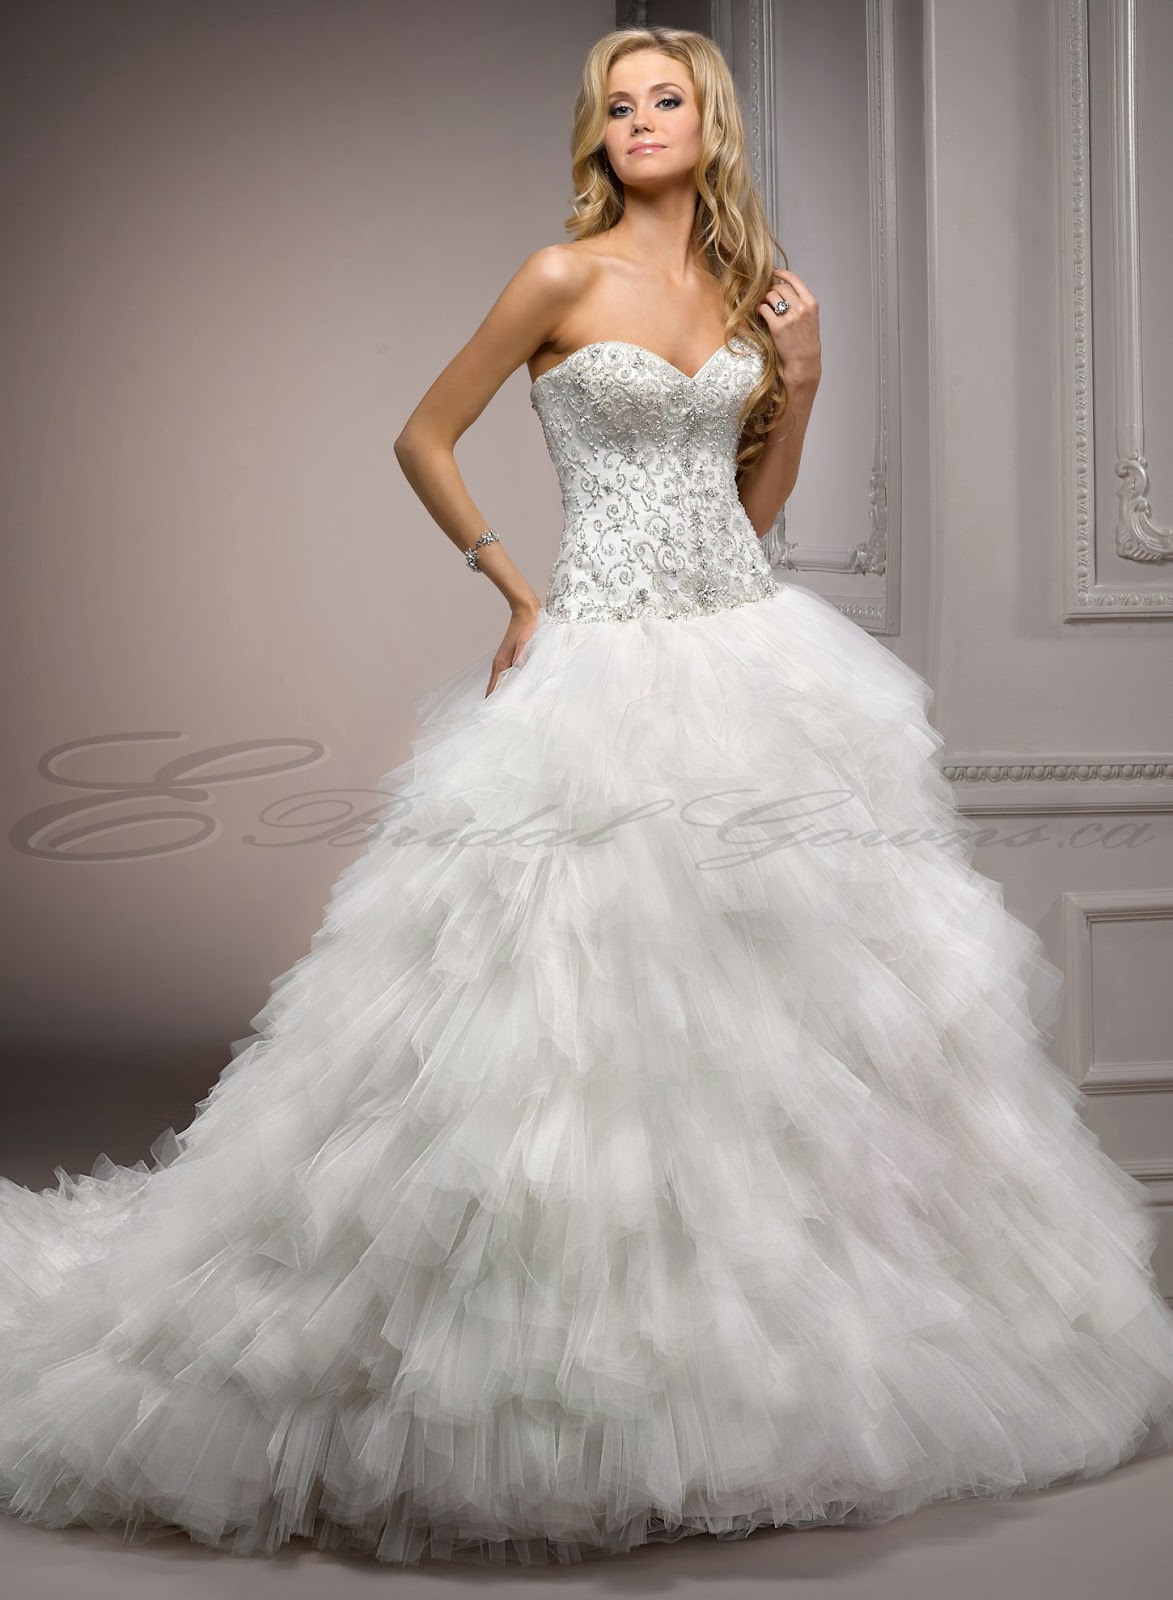 wedding dresses cheap wedding dresses for cheap wedding dresses cheap